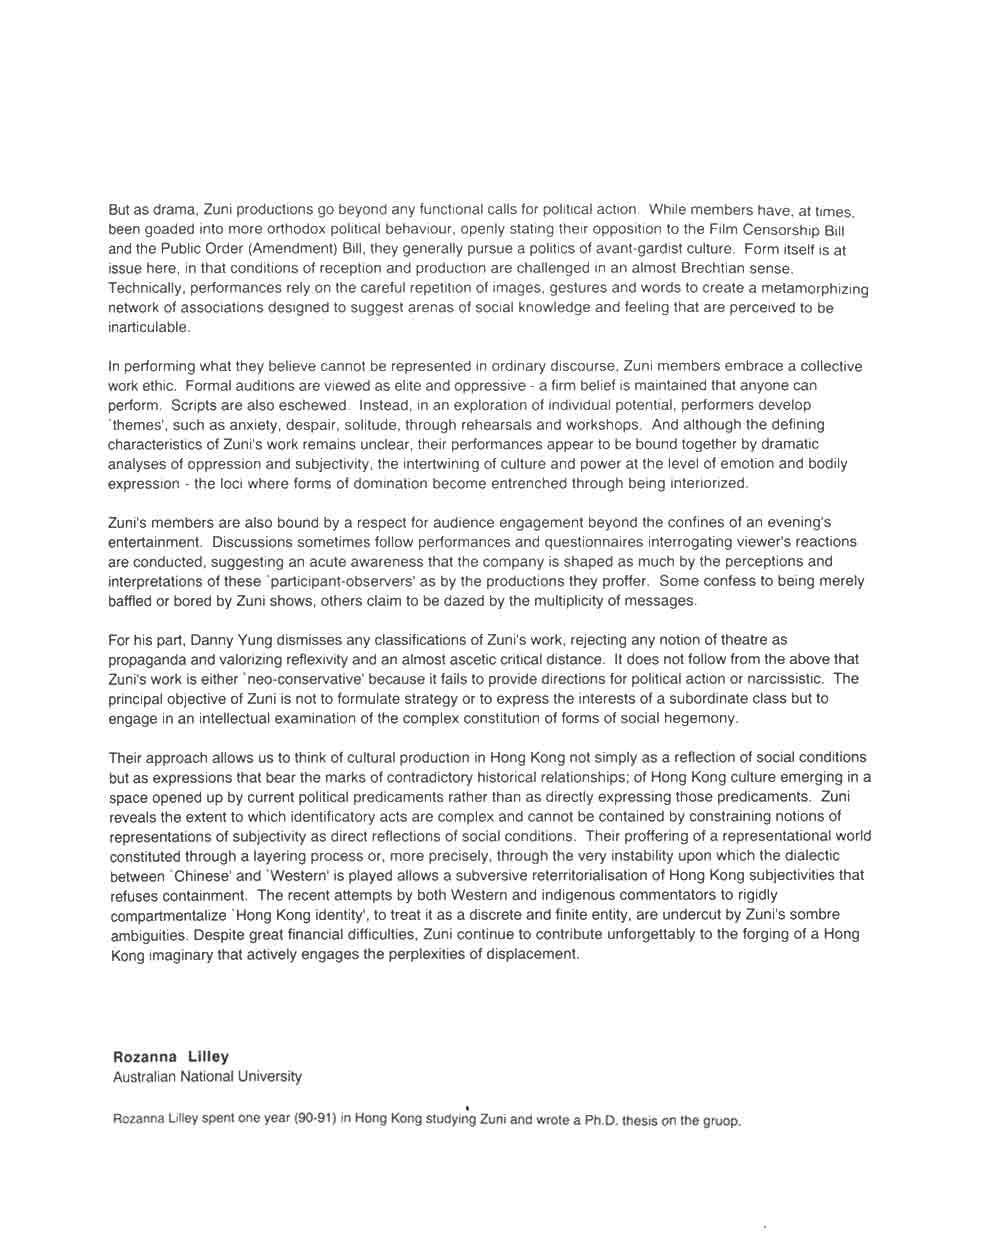 Reterritorialising Subjectivity: Chronicle of a Zuni Observer, essay, pg 2